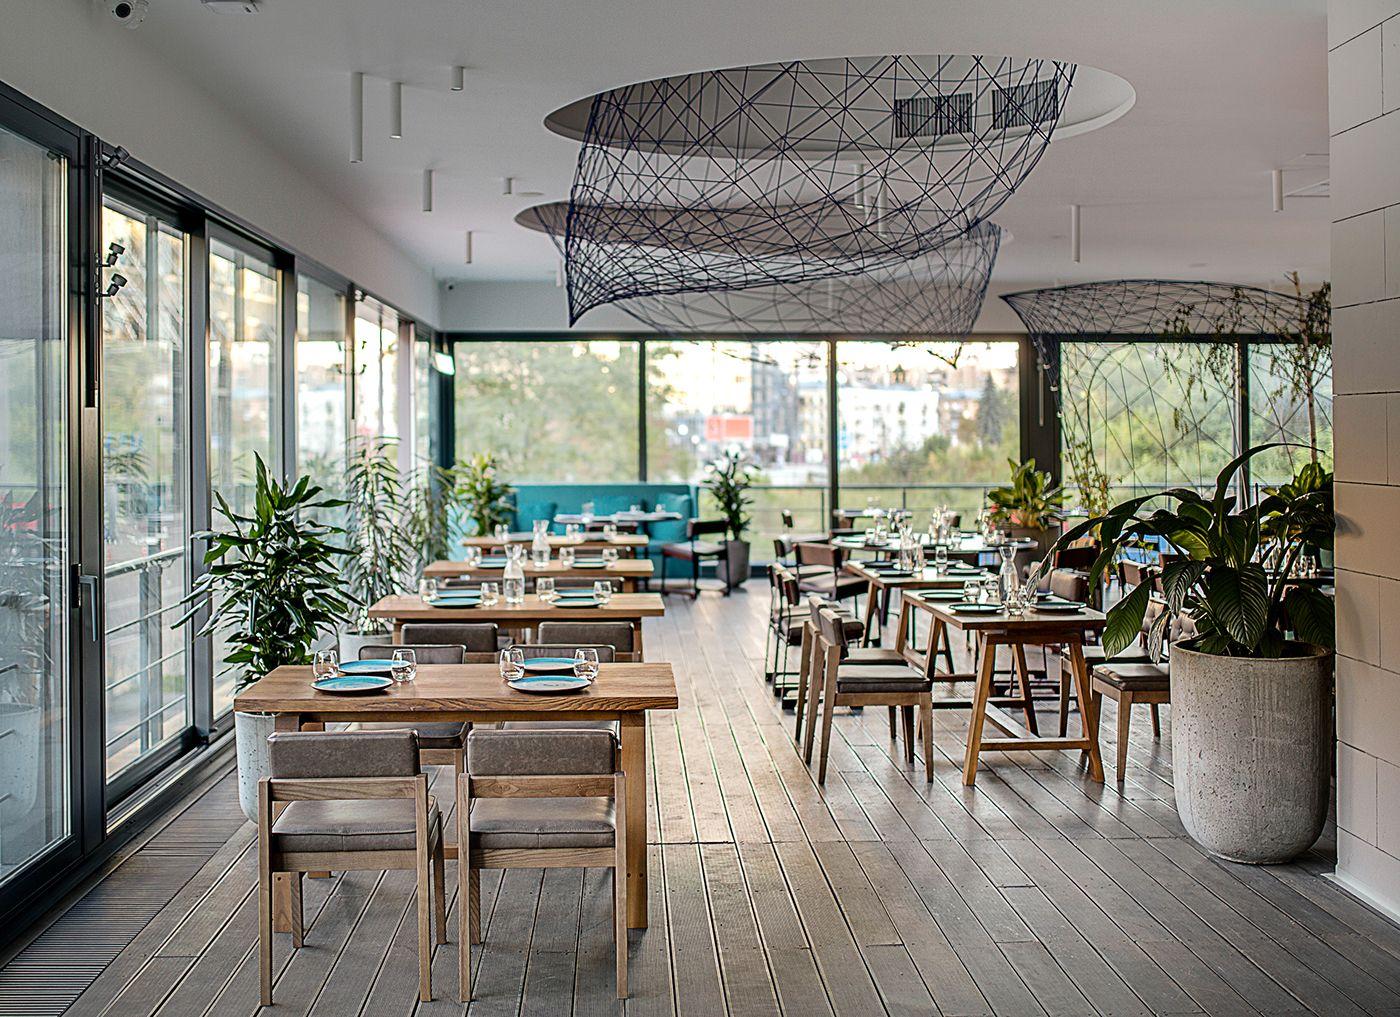 Restaurant interior design, Barvy restaurant, ceiling decor, birds ...